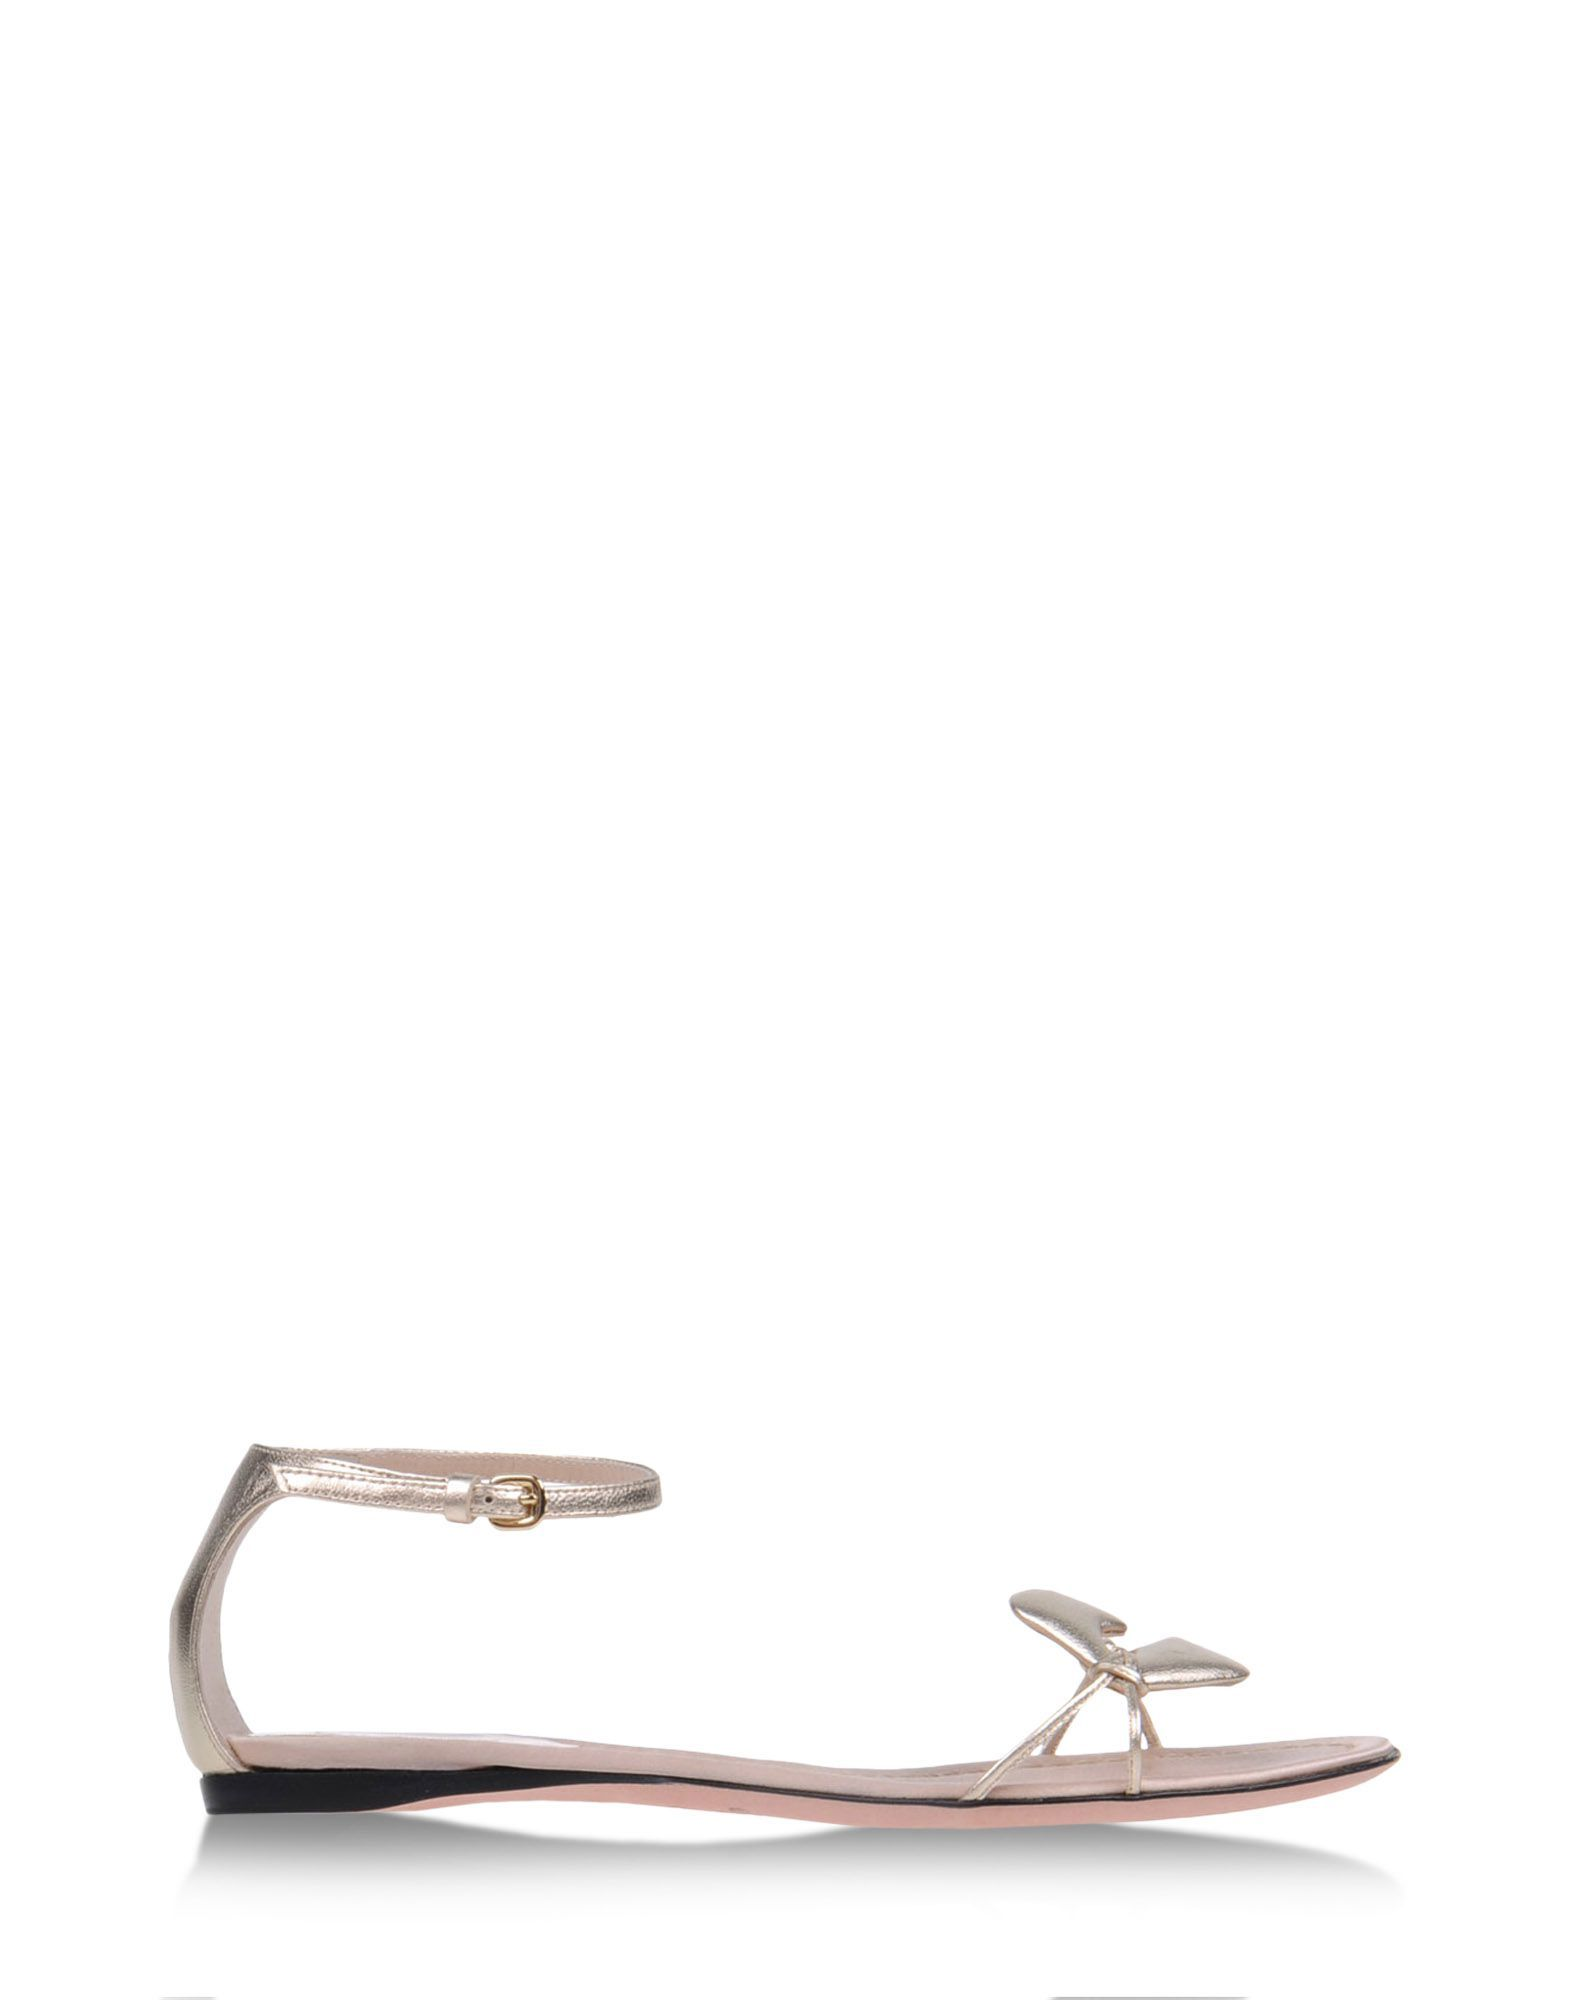 Metallic Shoes at #ShopBAZAAR - Giambattista Valli Champagne Gold Lips Sandals